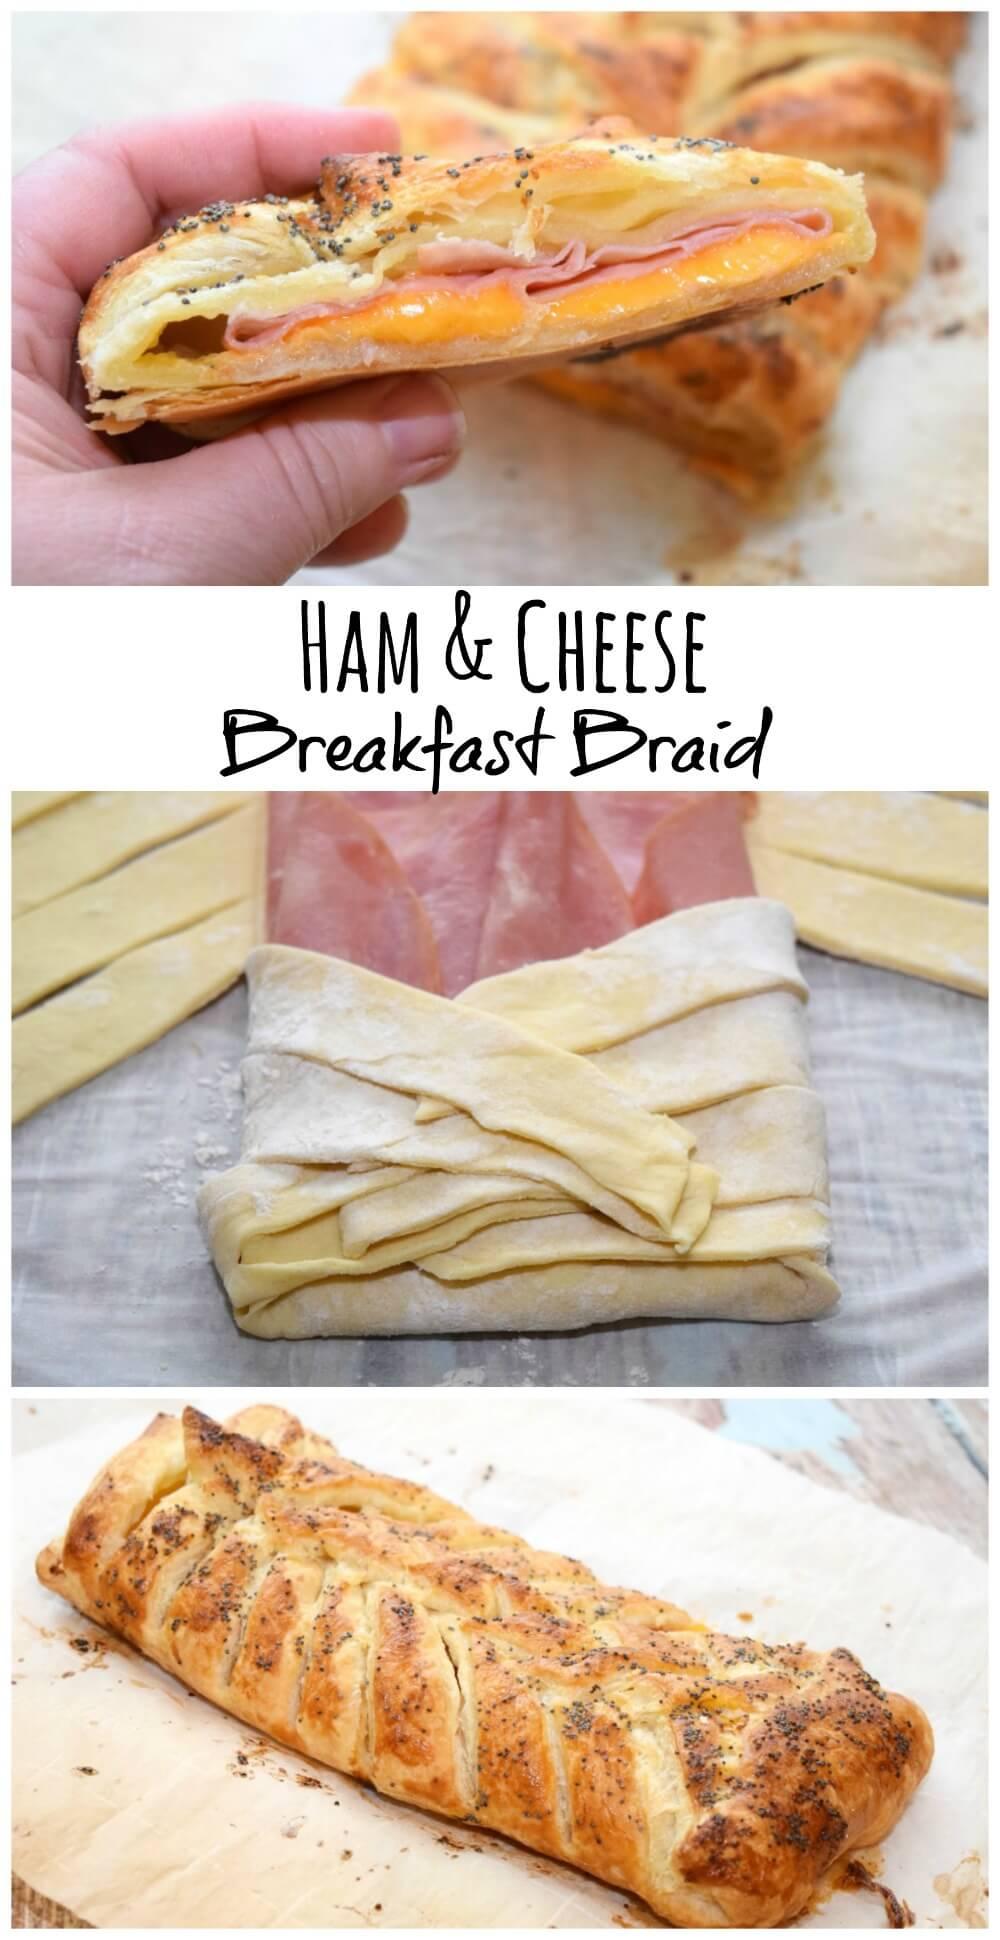 Get #BeyondTheSanwich w/this easy Ham and Cheese Breakfast Braid #ad @Walmart